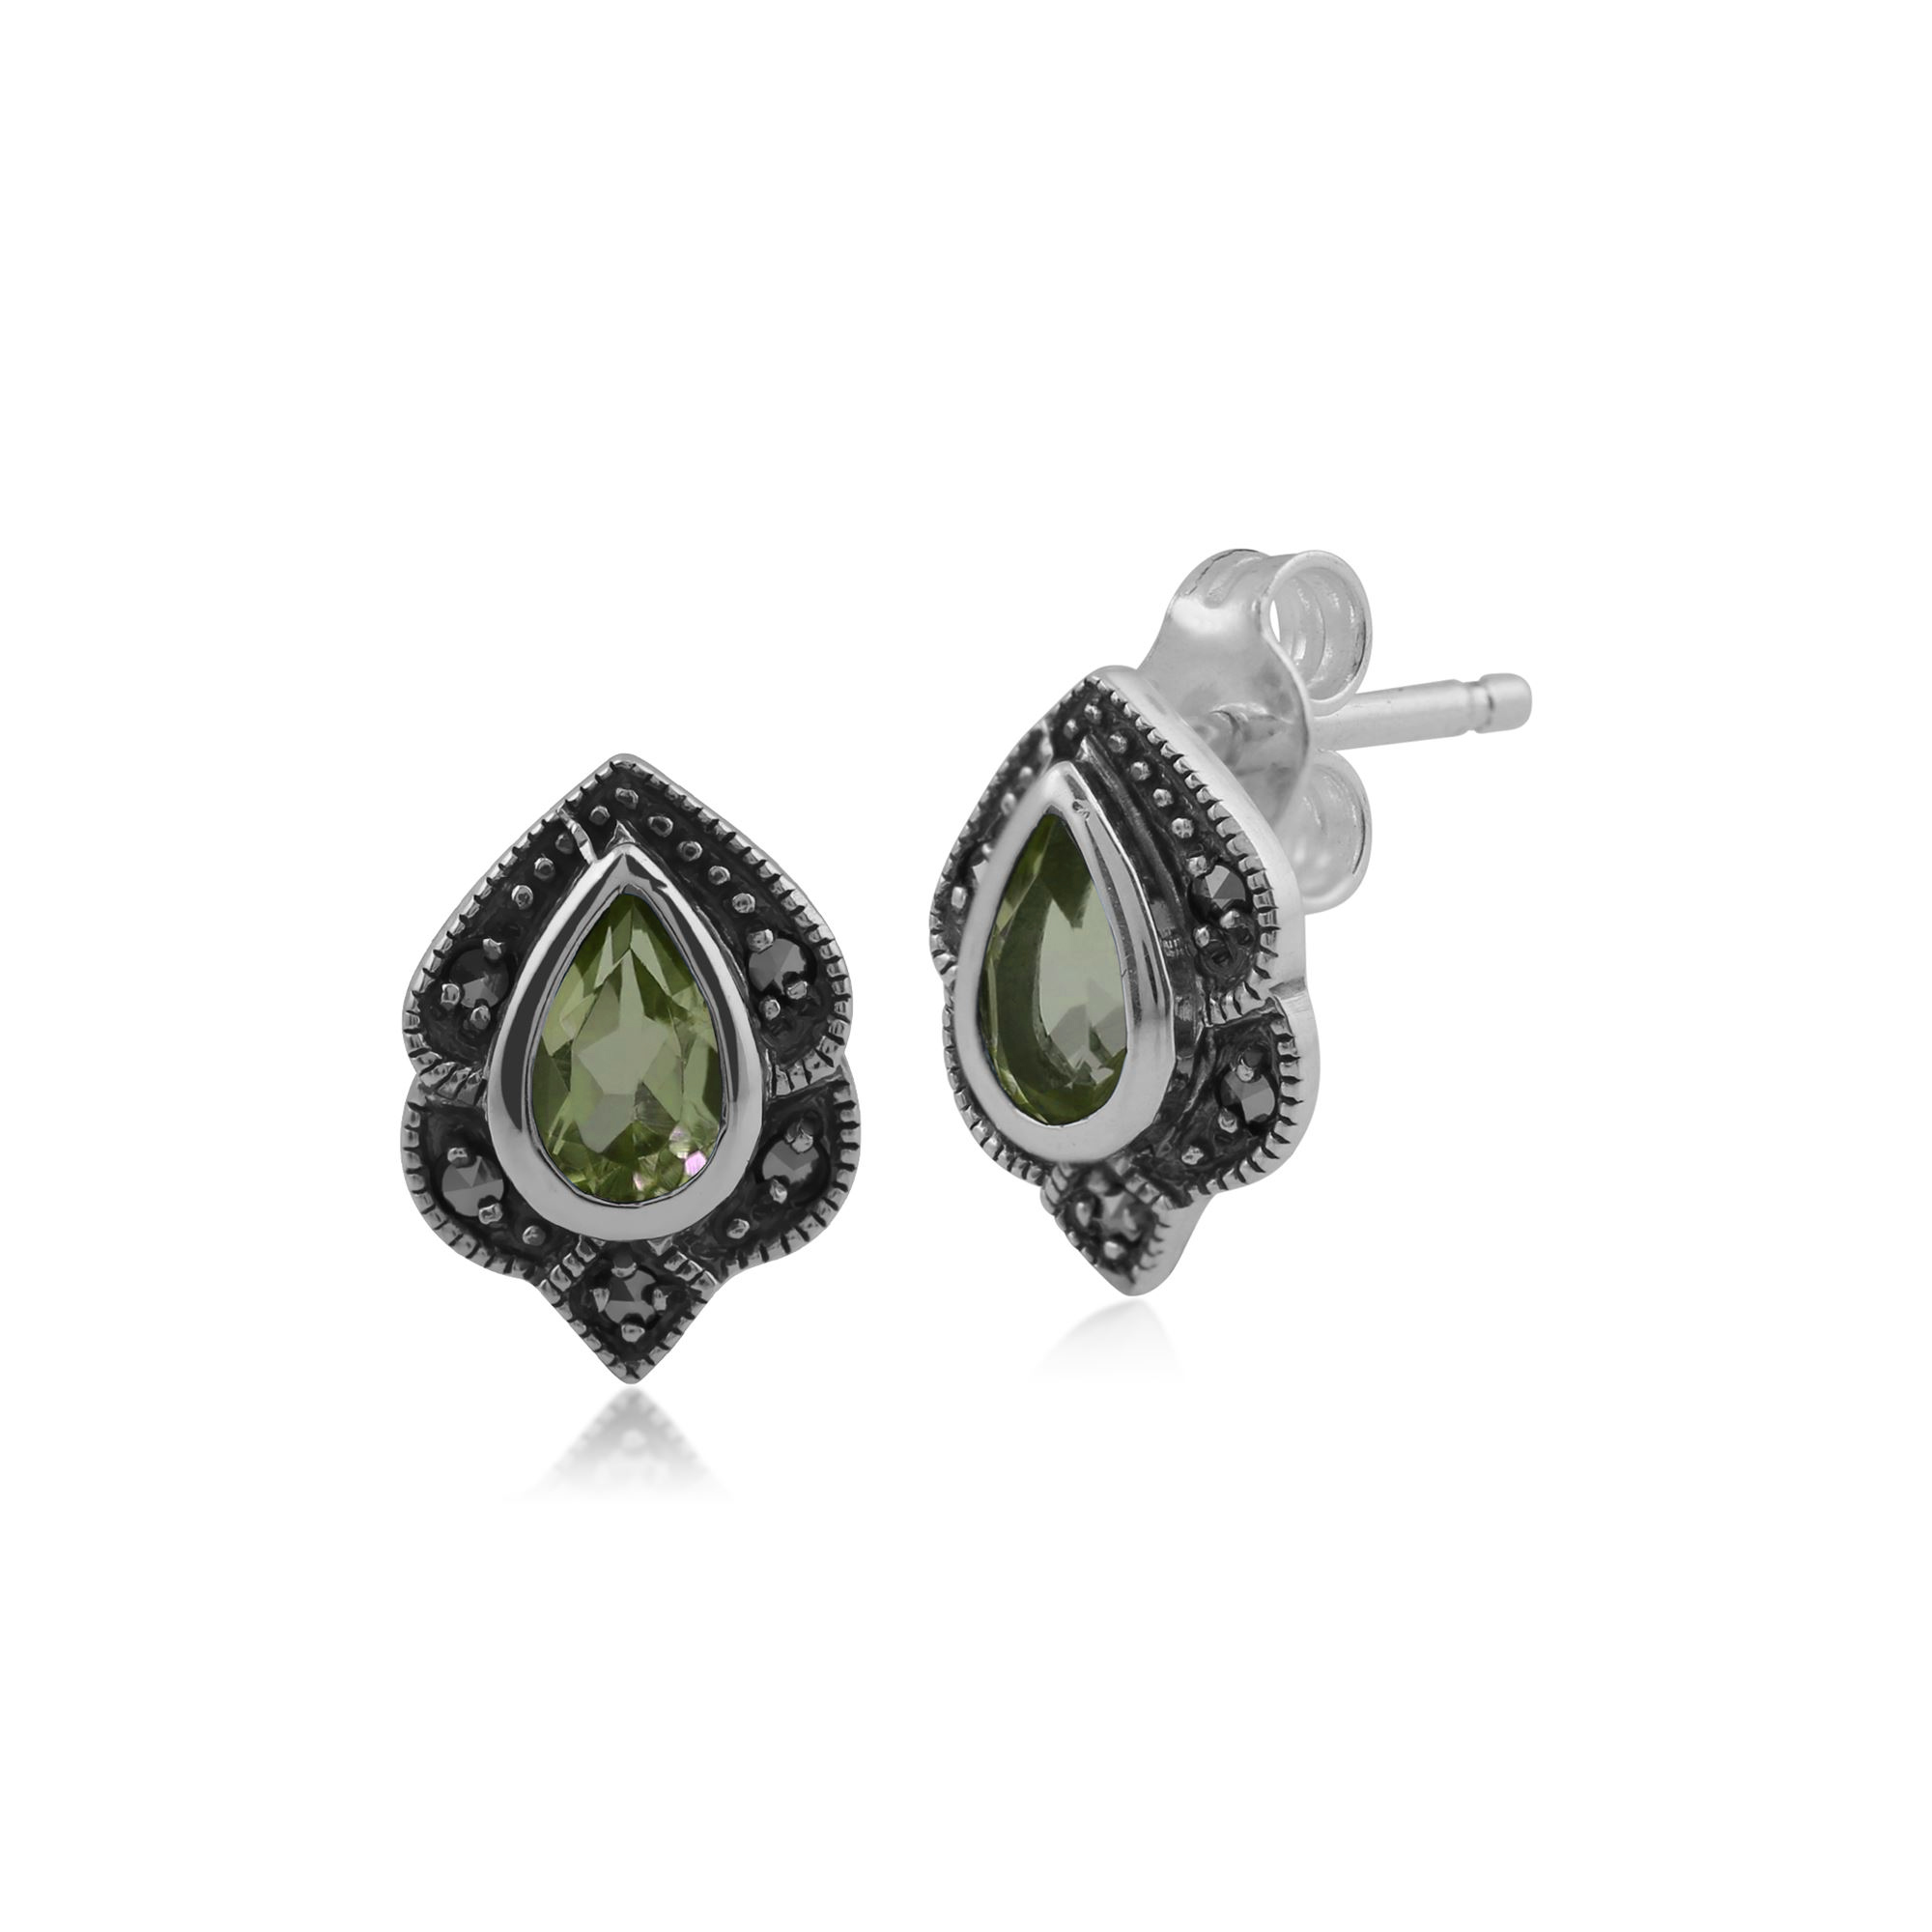 925 plata esterlina 0.03ct Marcasita Rennie Mackintosh estilo anillo de estilo Art Nouveau